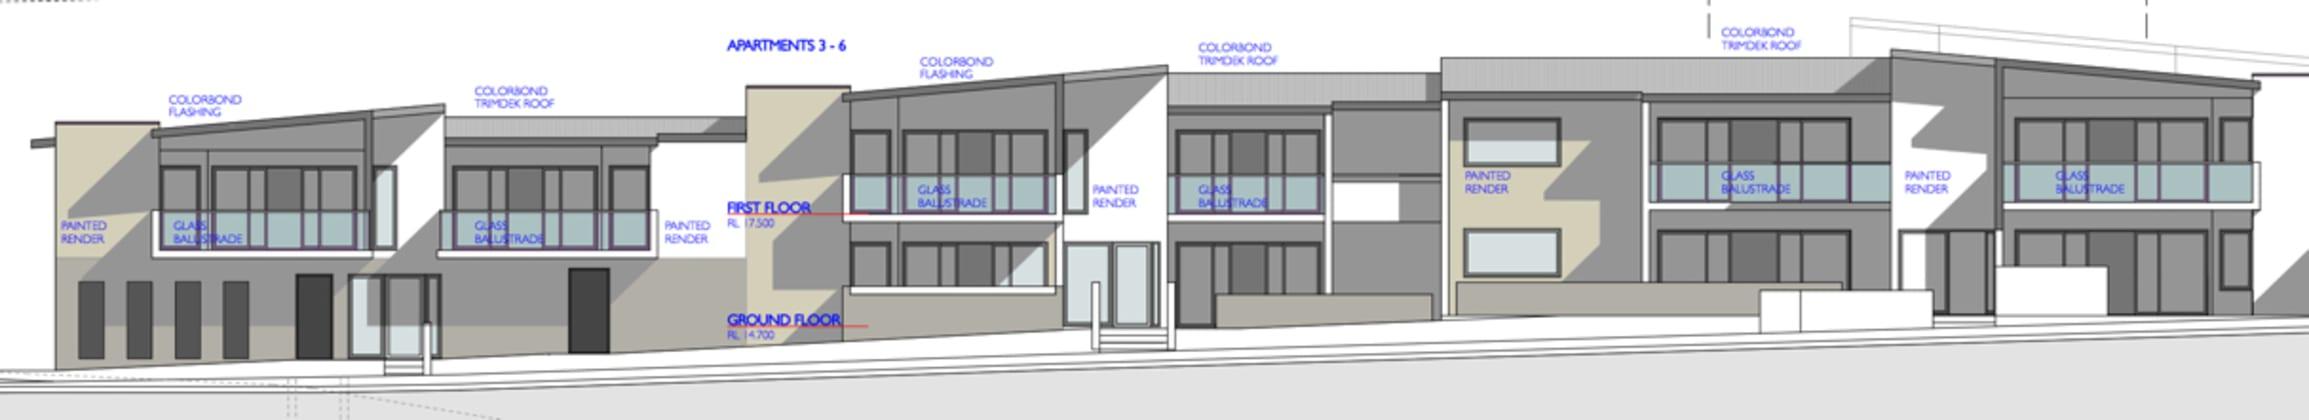 Pembroke & Bruce Apartments - 2B Bruce Street, Carina. Planning Image: Michael Stewart Architect